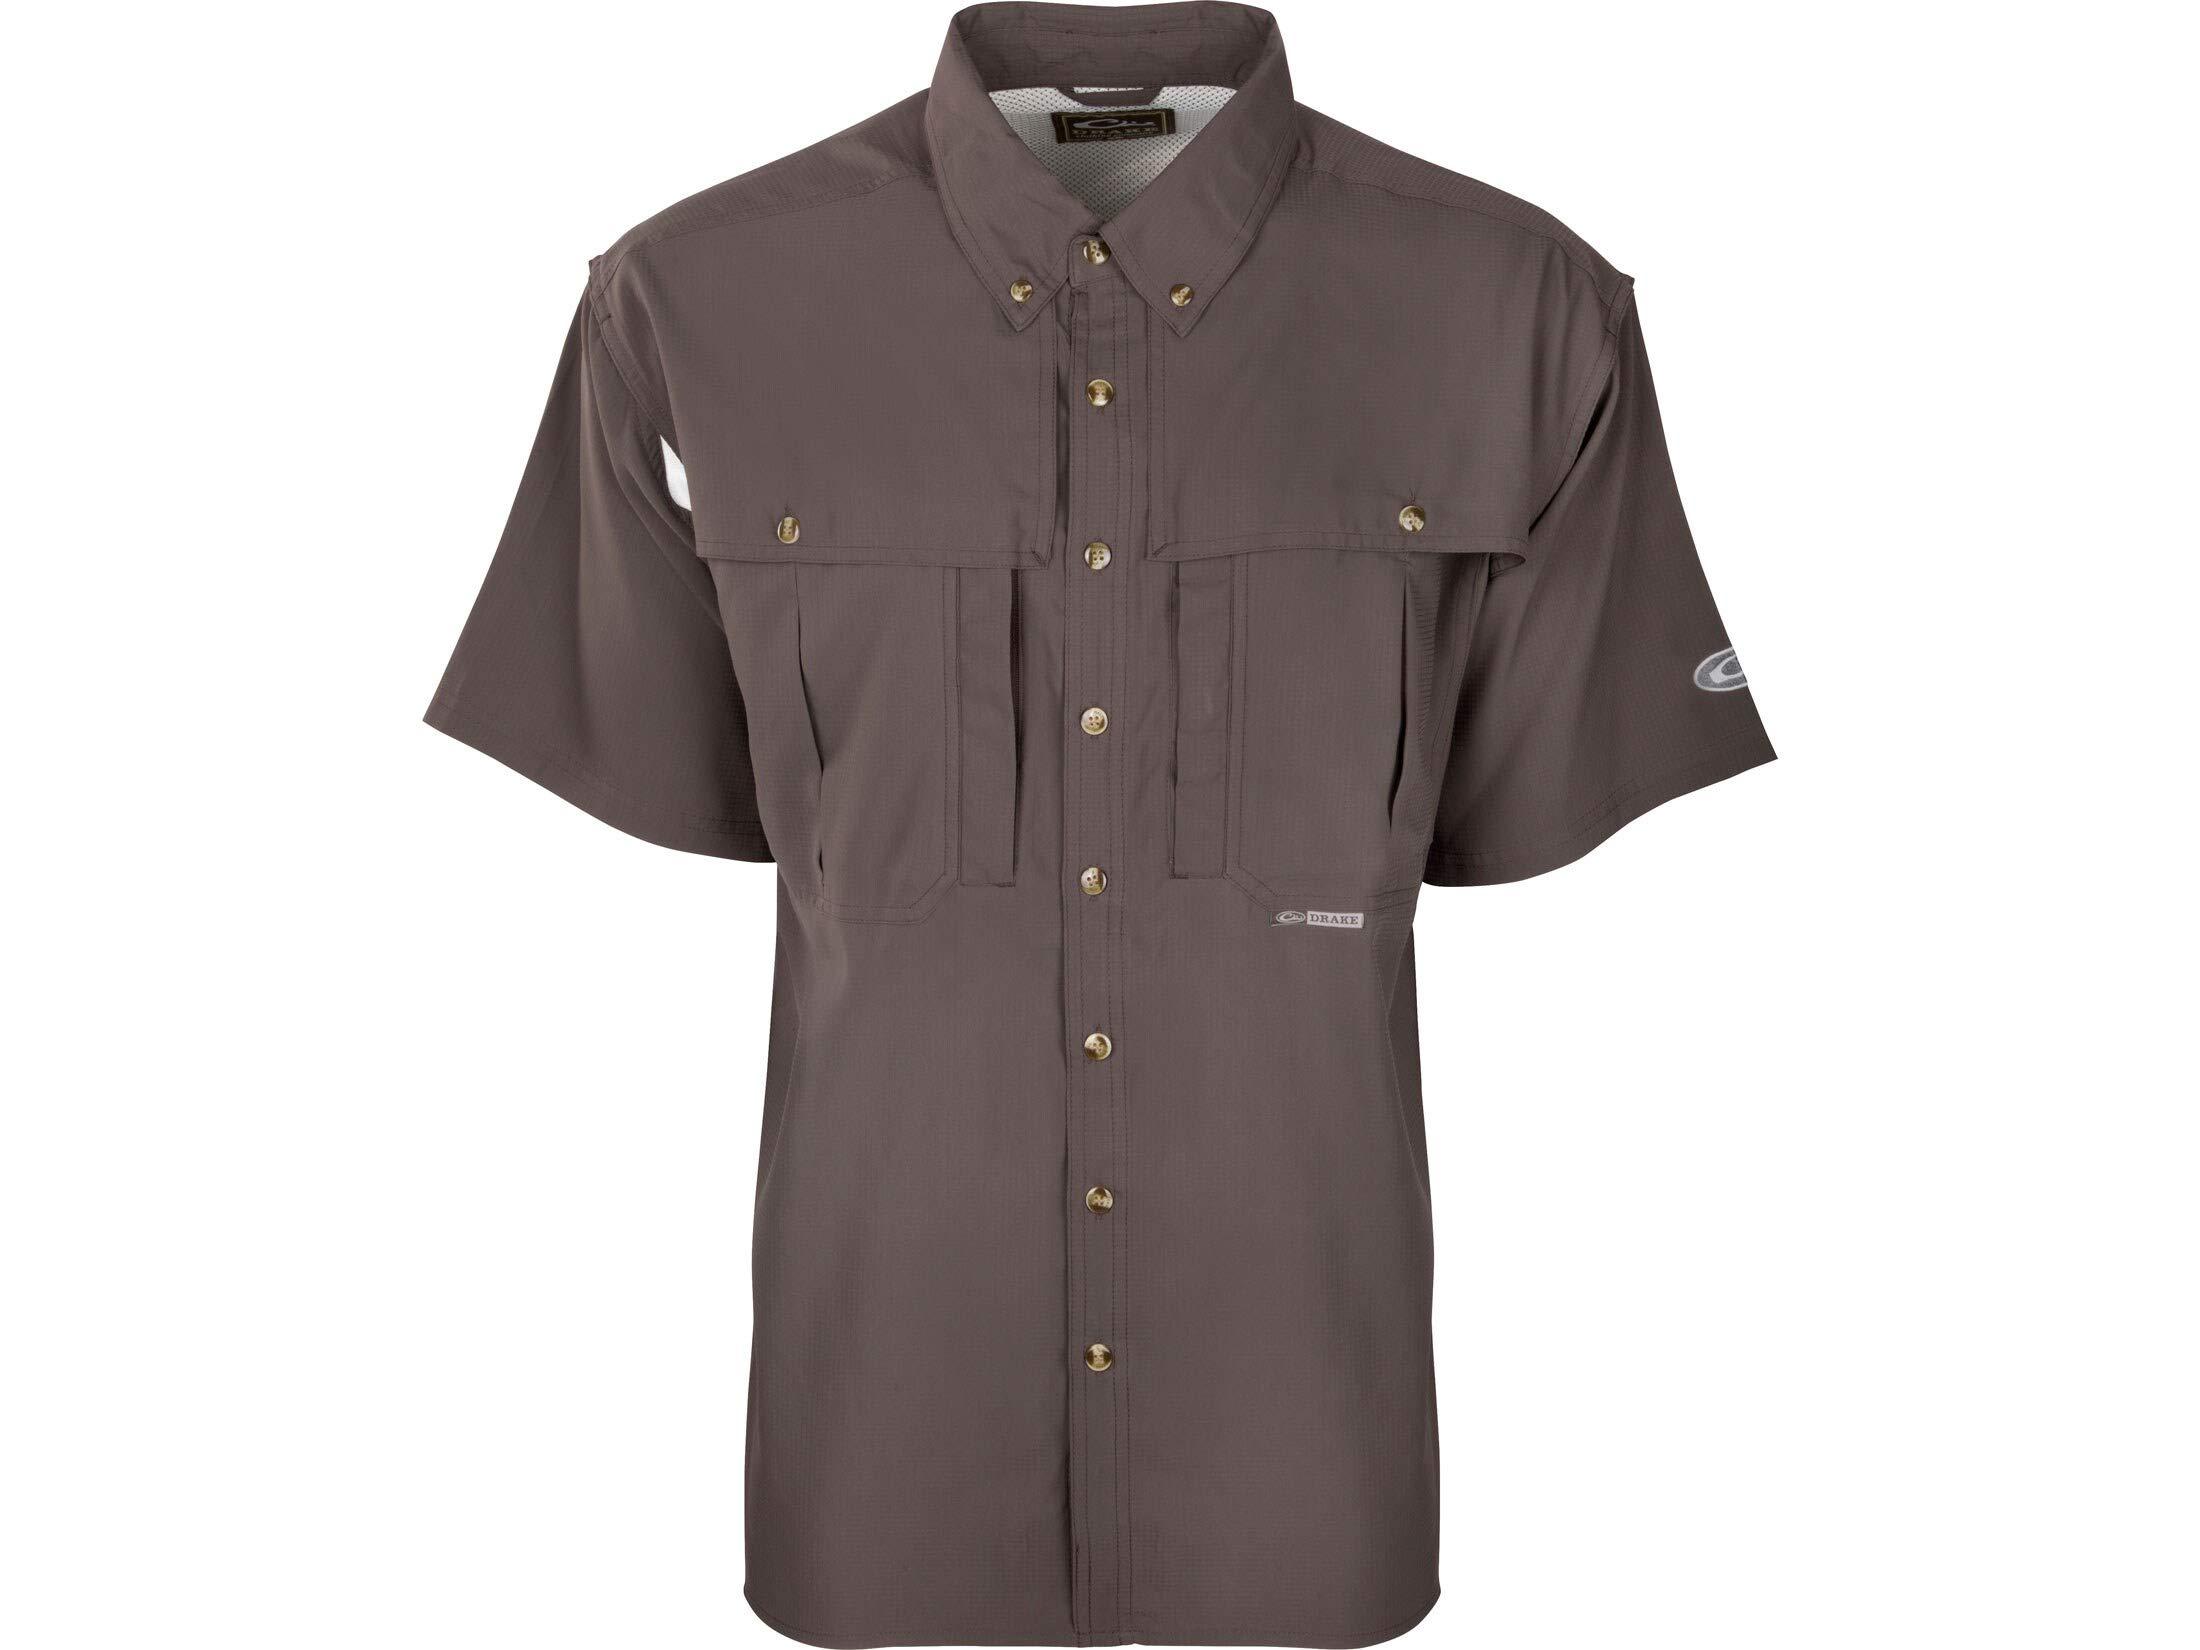 Drake Men's Flyweight Wingshooter's Shirt Short Sleeve Polyester Gray Medium by Drake